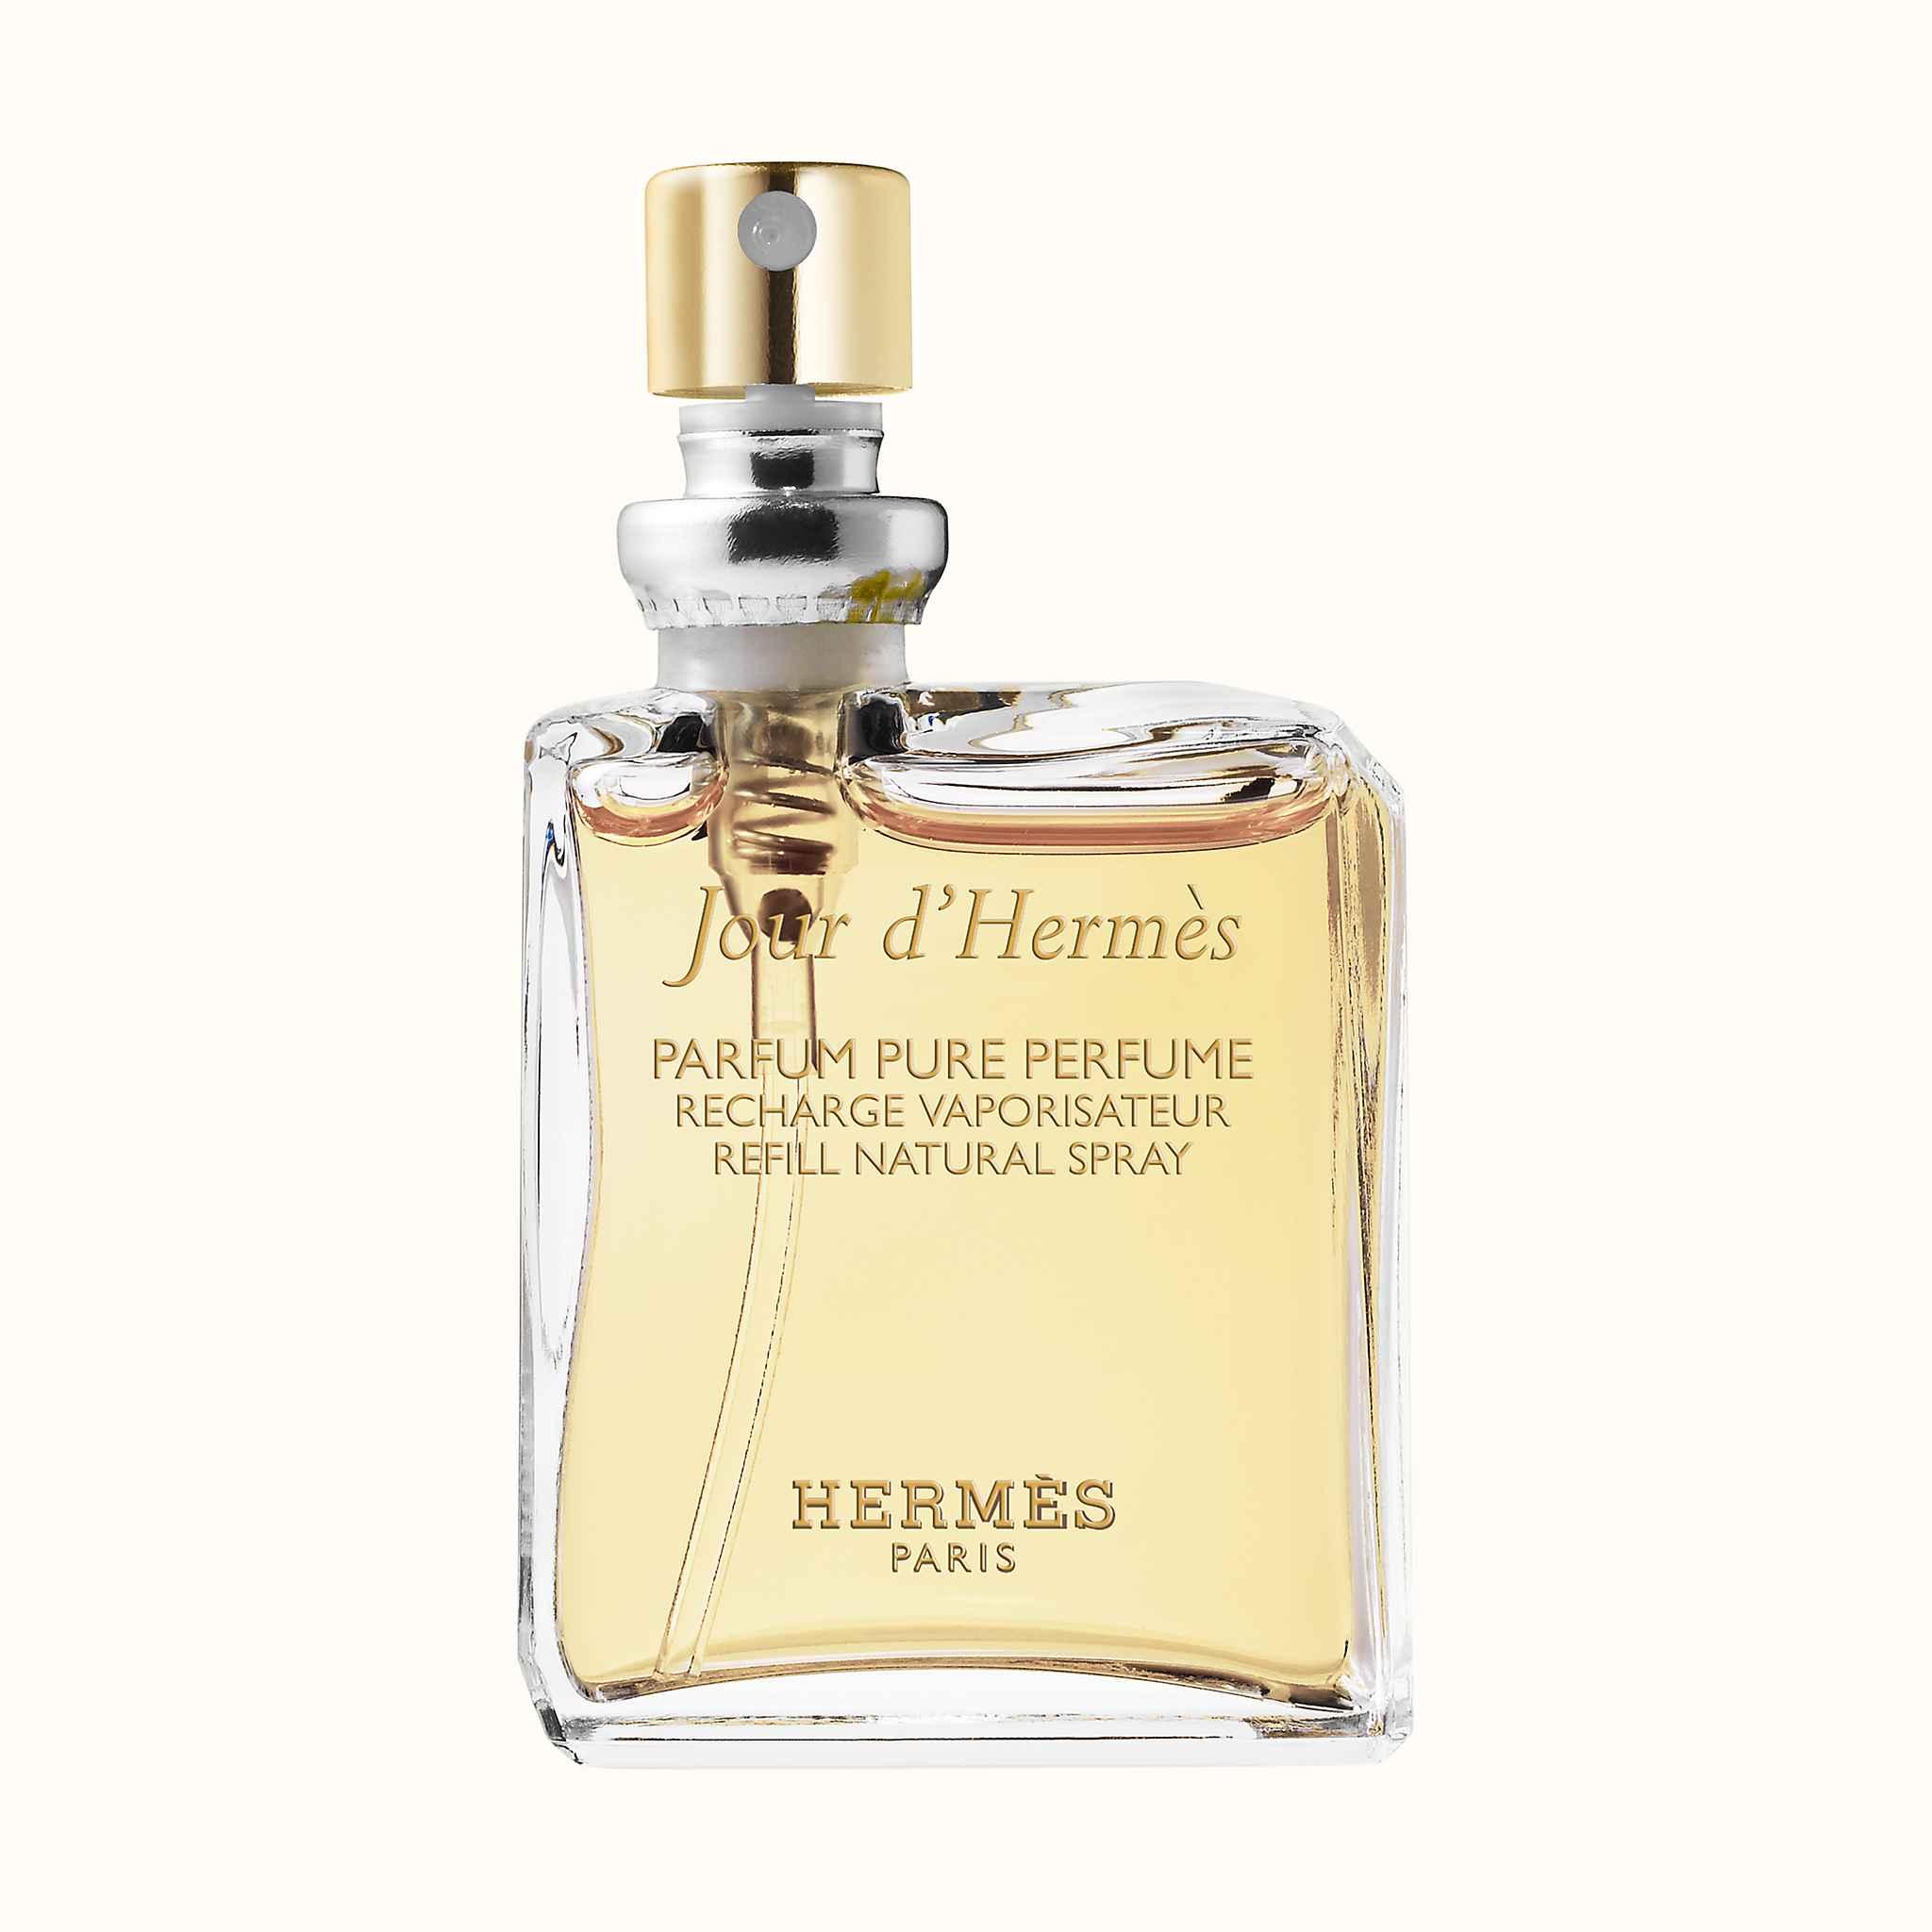 D'hermes Parfum Wk0xon8p De Extrait Jour N08wvmn Refillhermès ZwOXiTPku